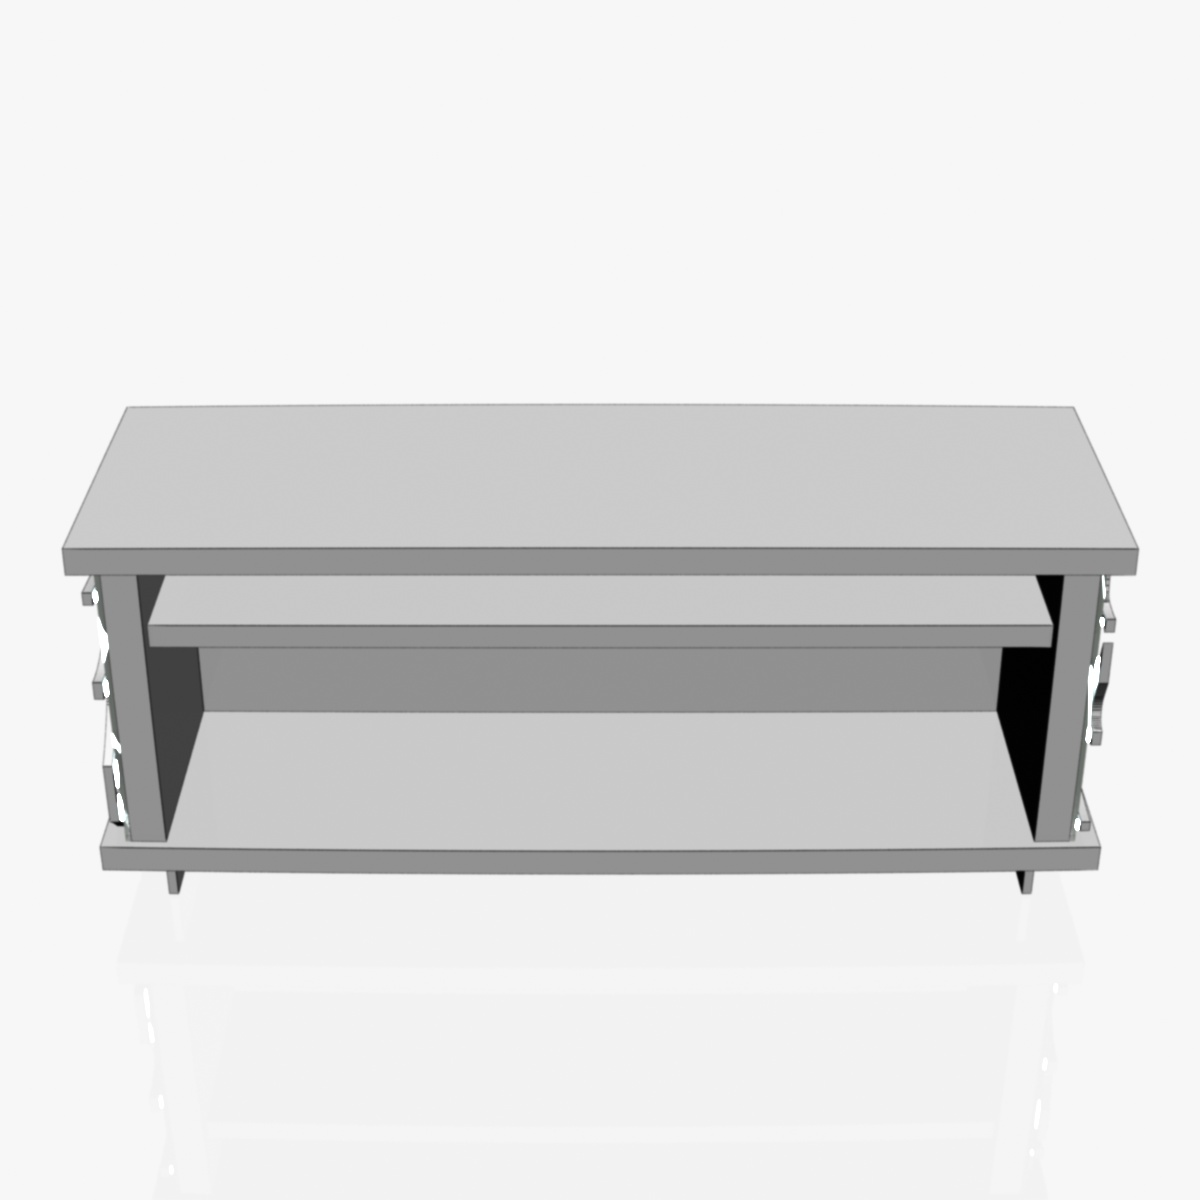 table 1 3d model 3ds max dxf fbx  obj 219842